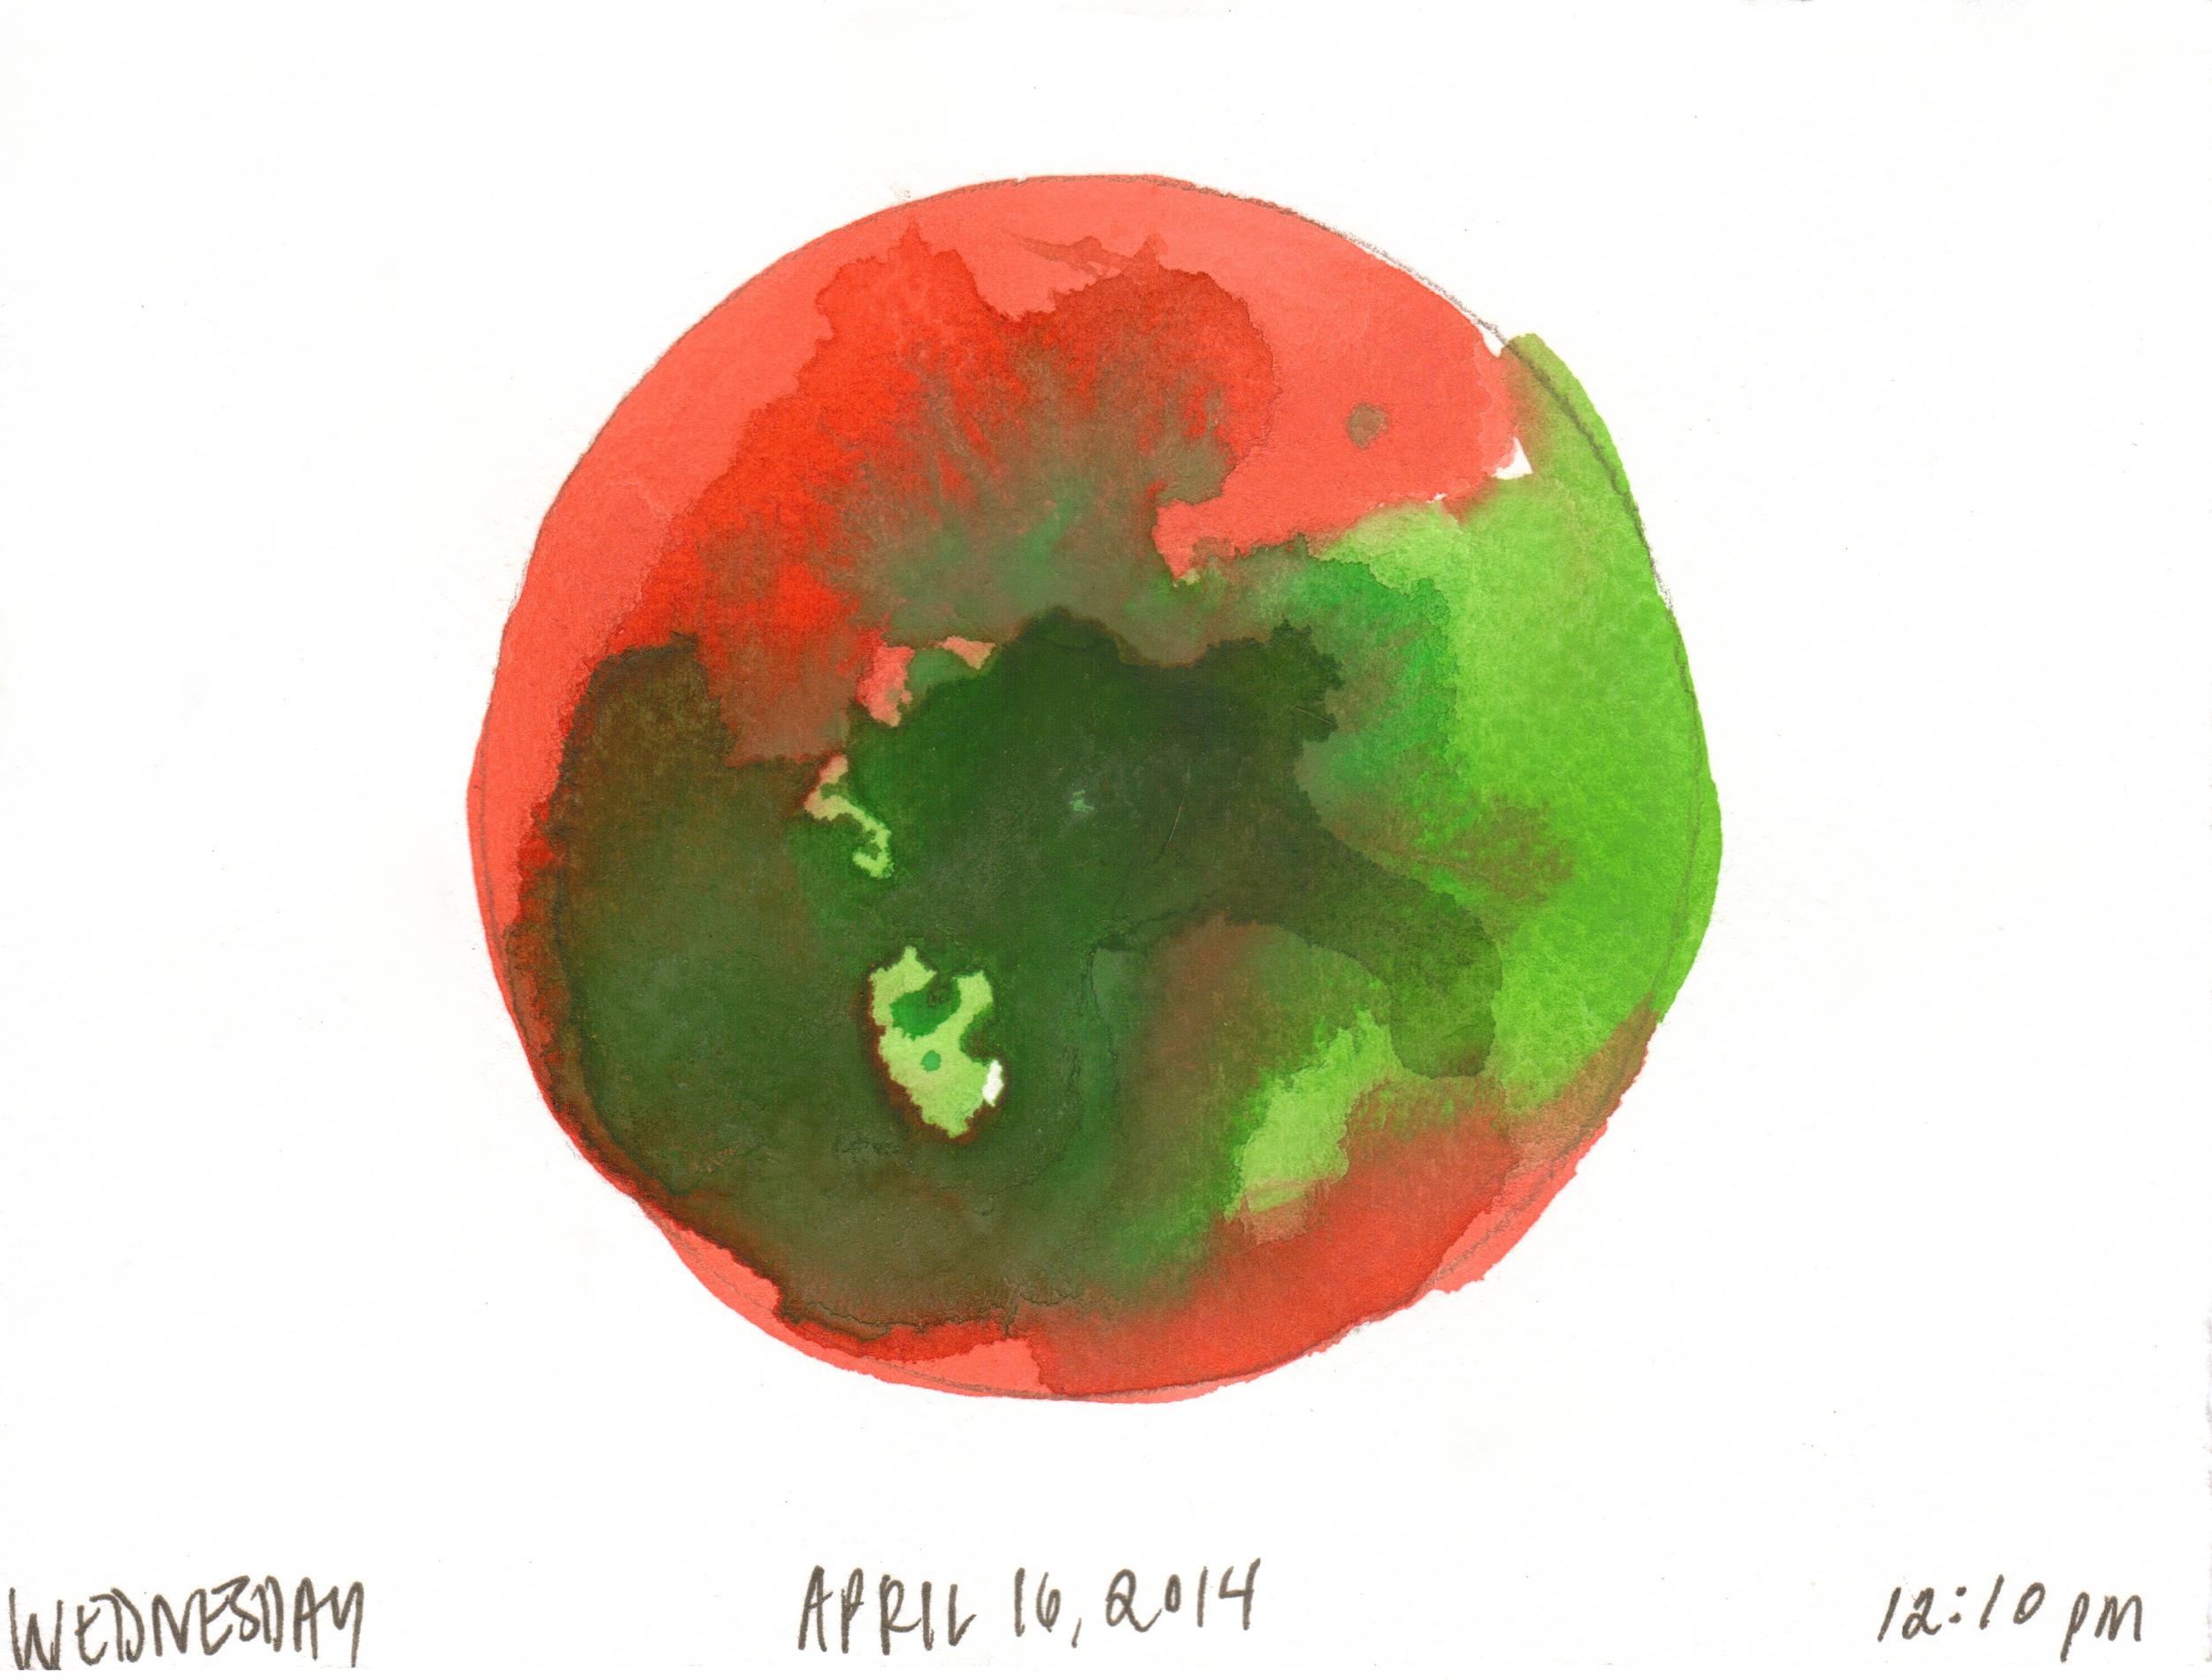 04.16.14